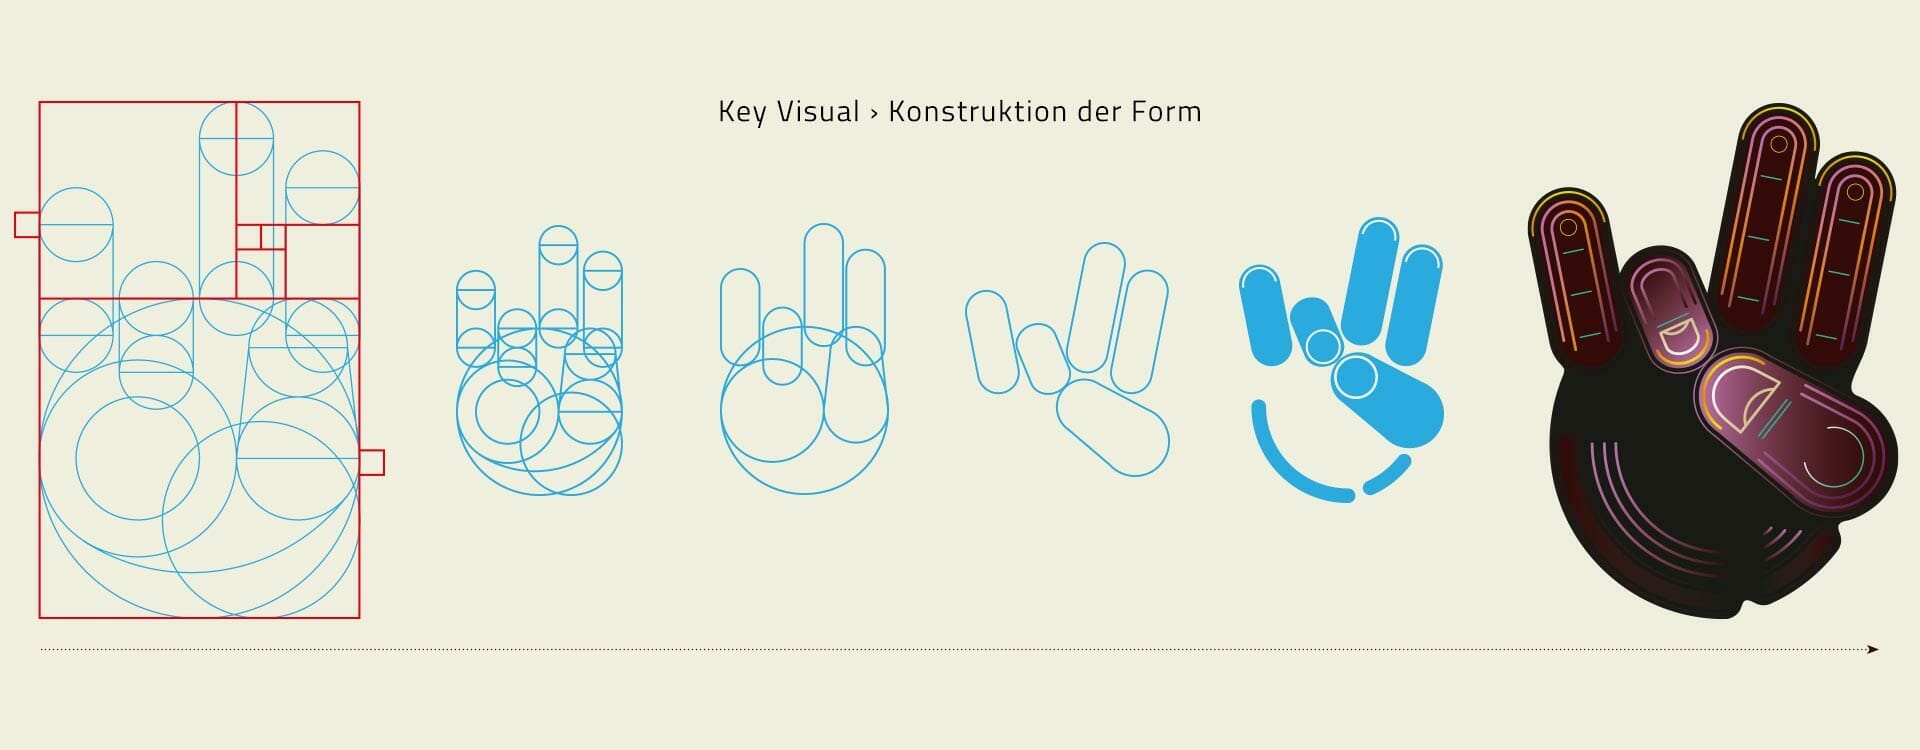 SOL Key Visual Konstruktion